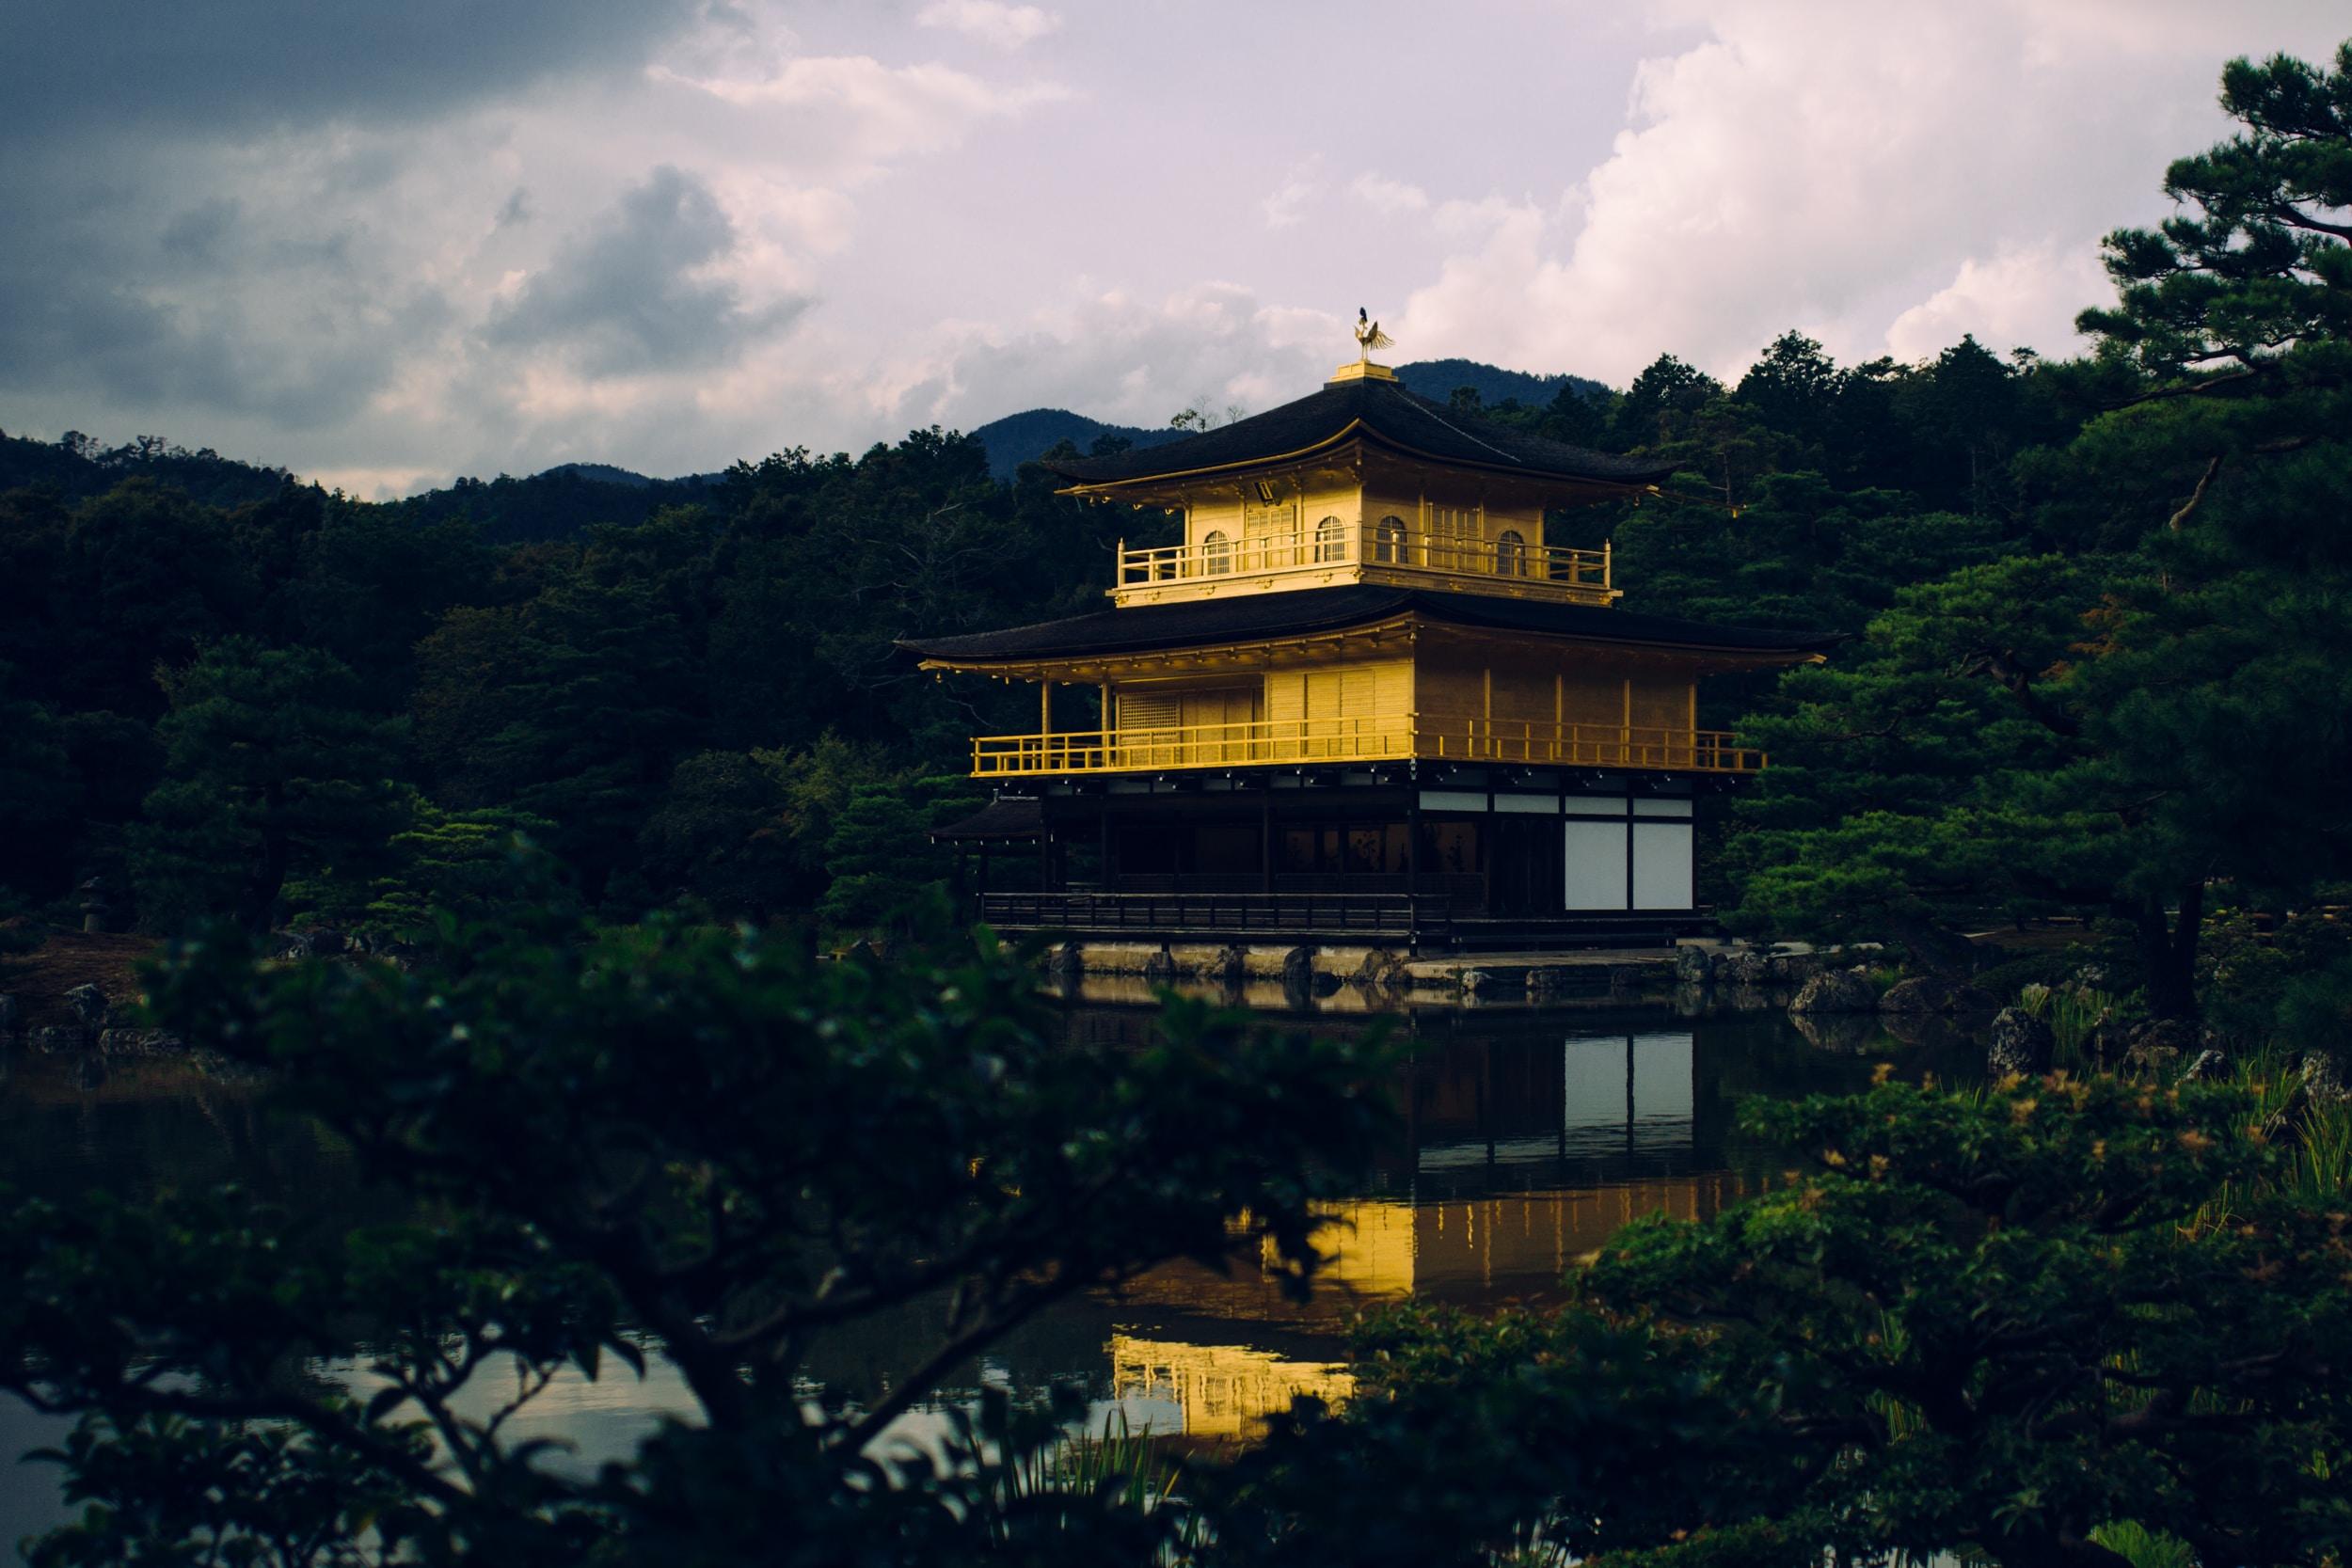 yellow and black pagoda near body of water